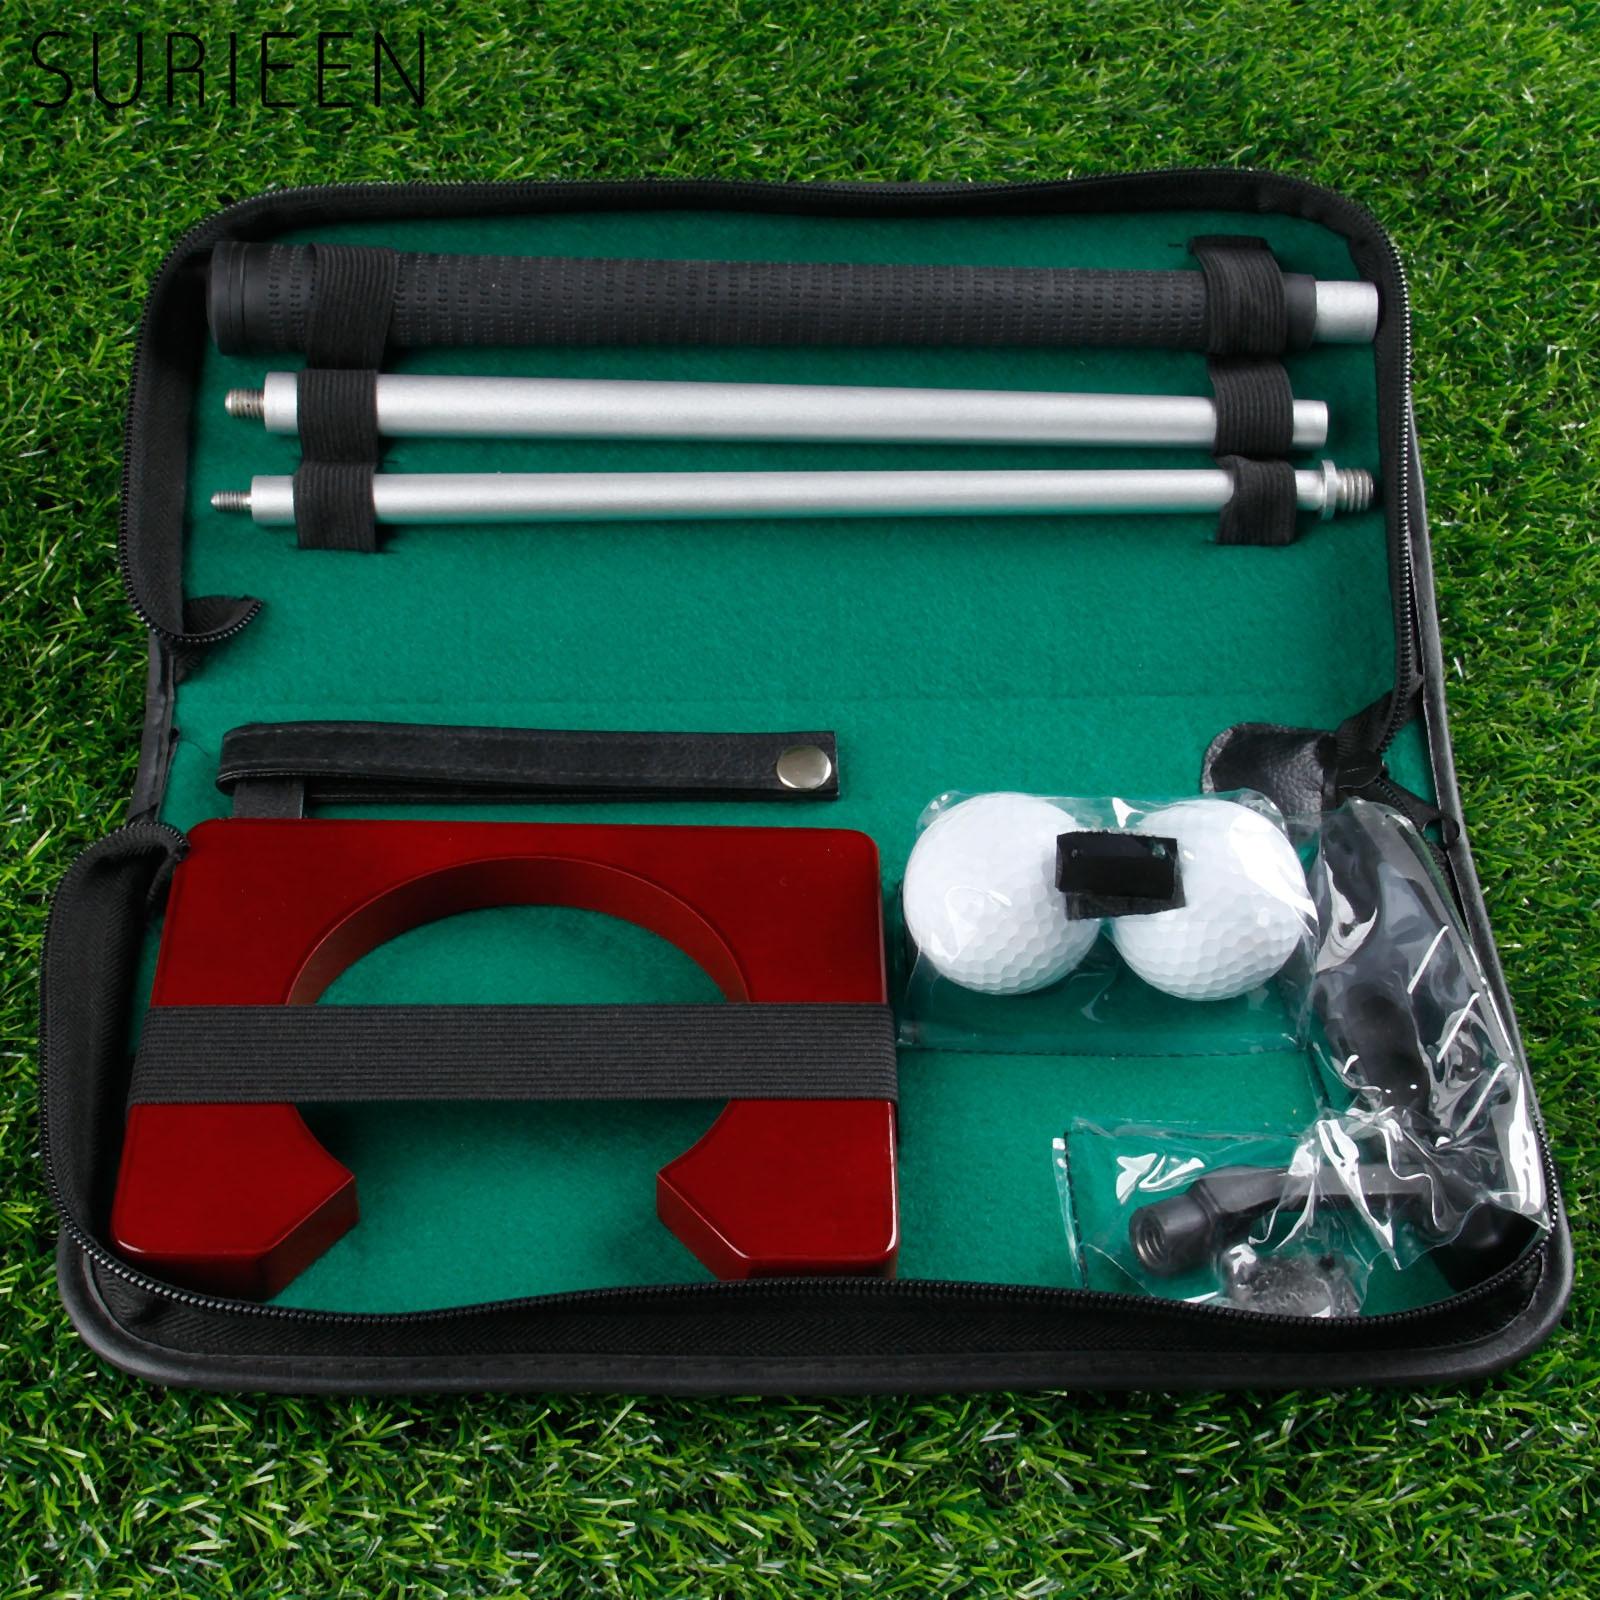 Portable Golf Tranning Aids Indoor Outdoor Golf Ball Holder Golf Putter Putting Practice Kit Golfer Training